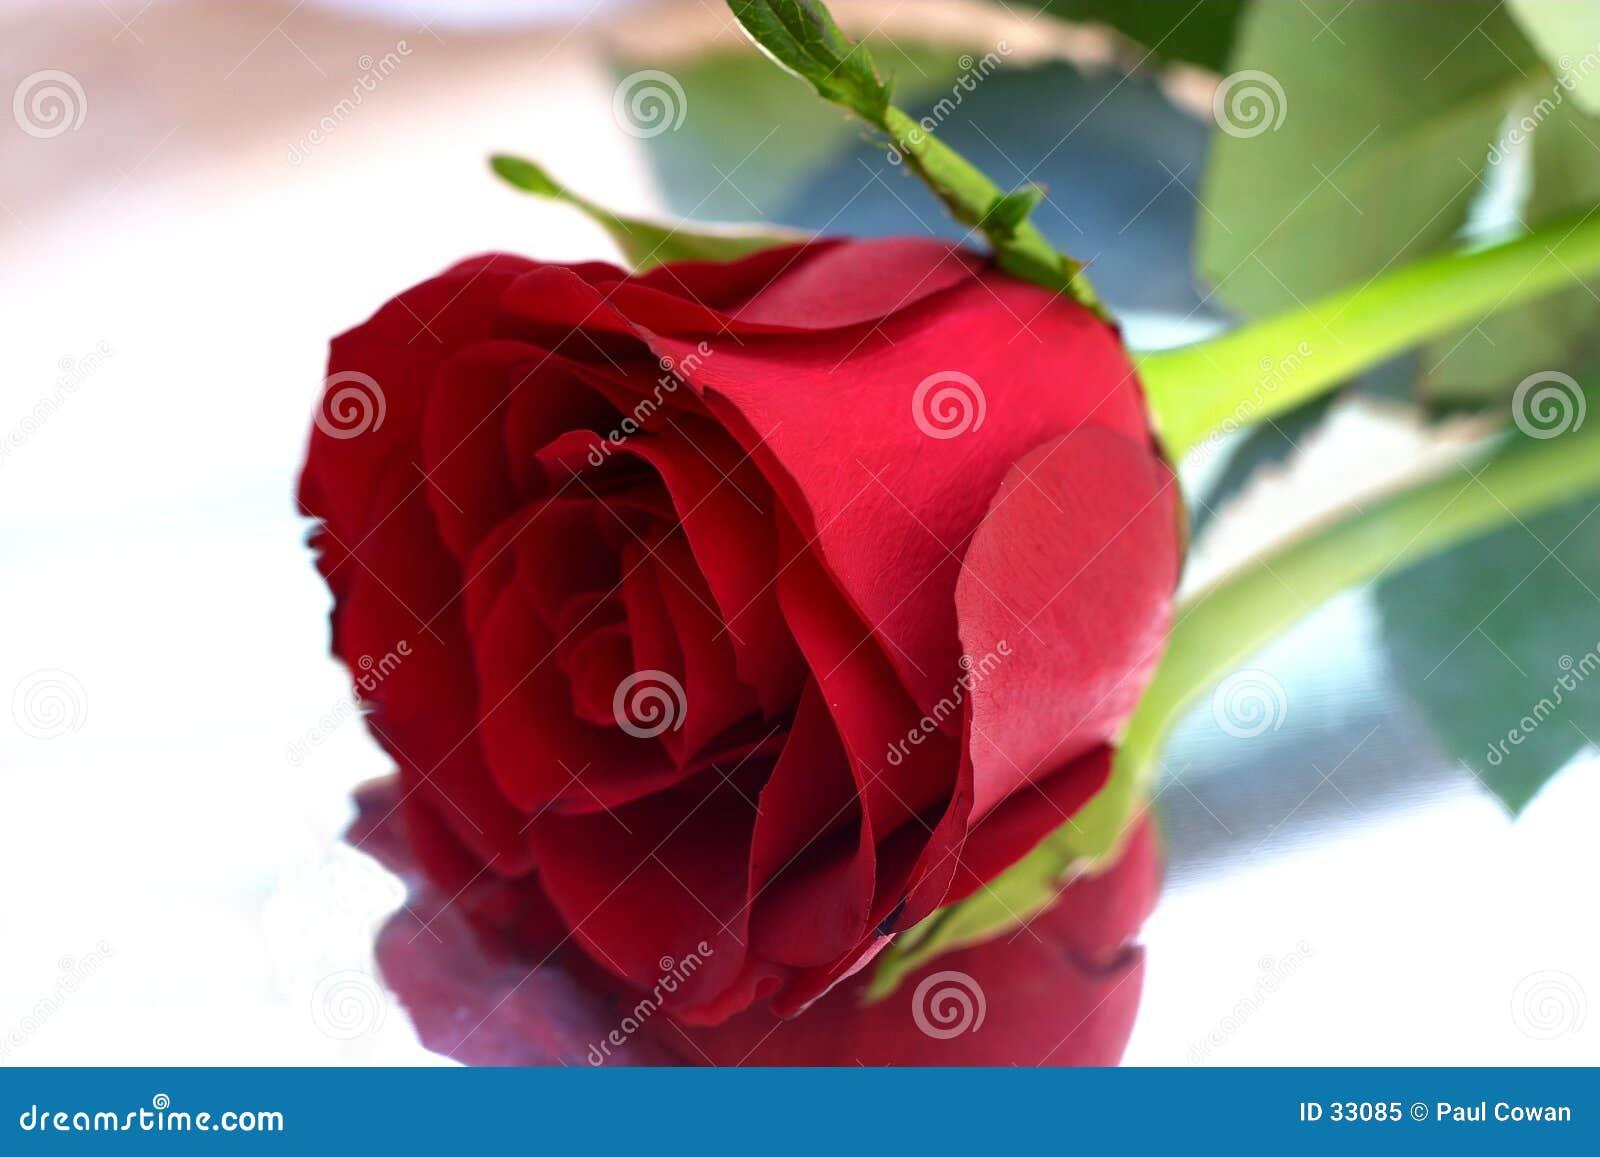 Red rose 7